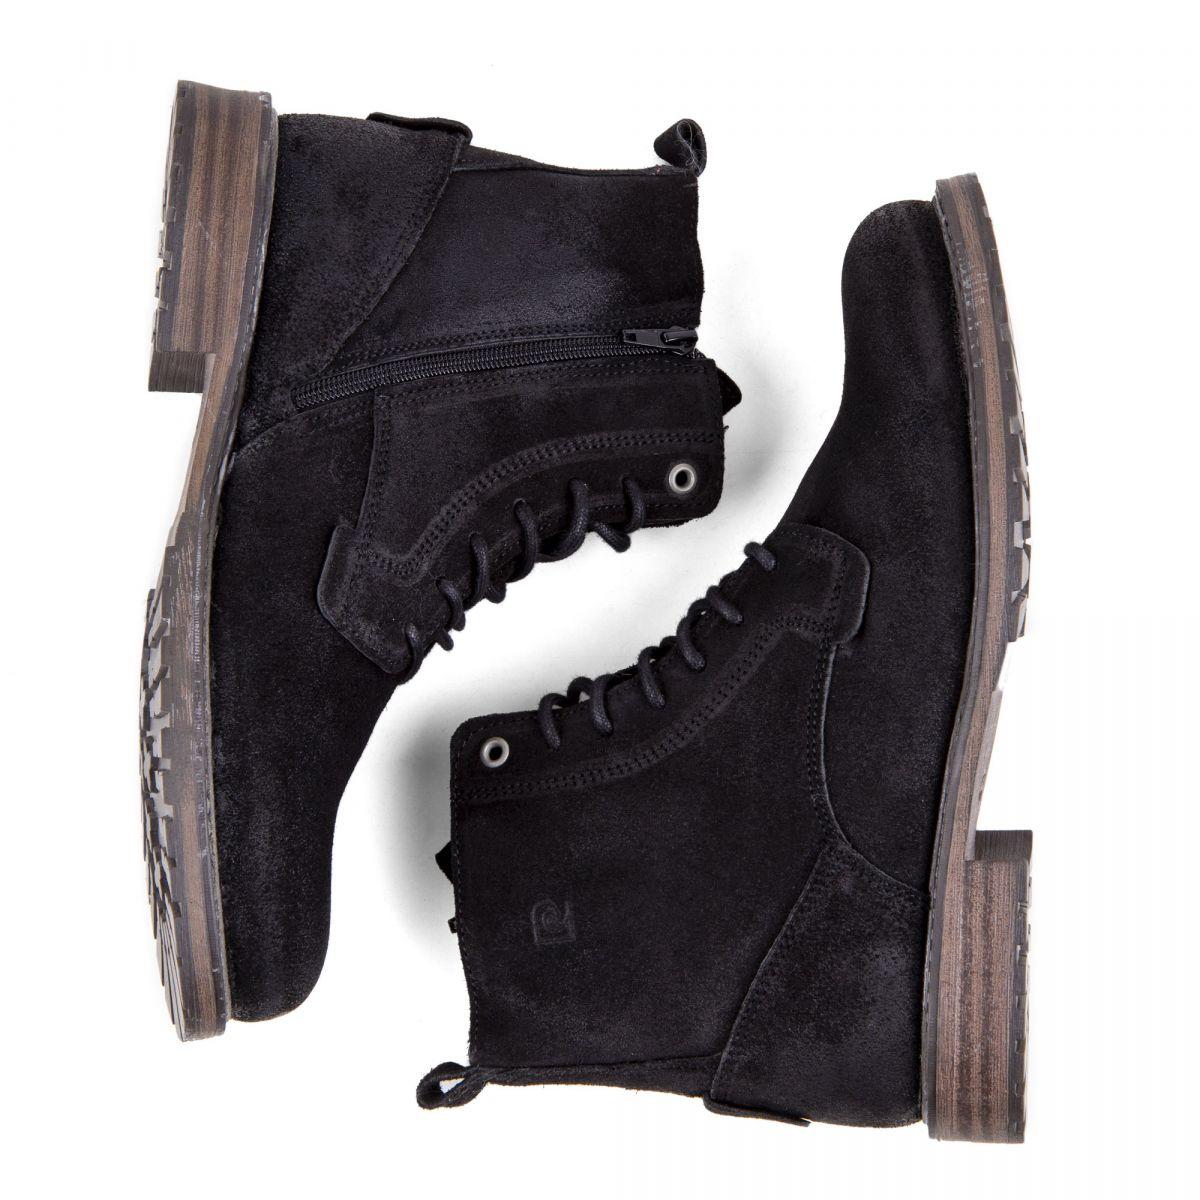 aa3603f51a1886 chaussures-boots-montantes-noires-cuir-retourne-homme-pierre-cardin.jpg